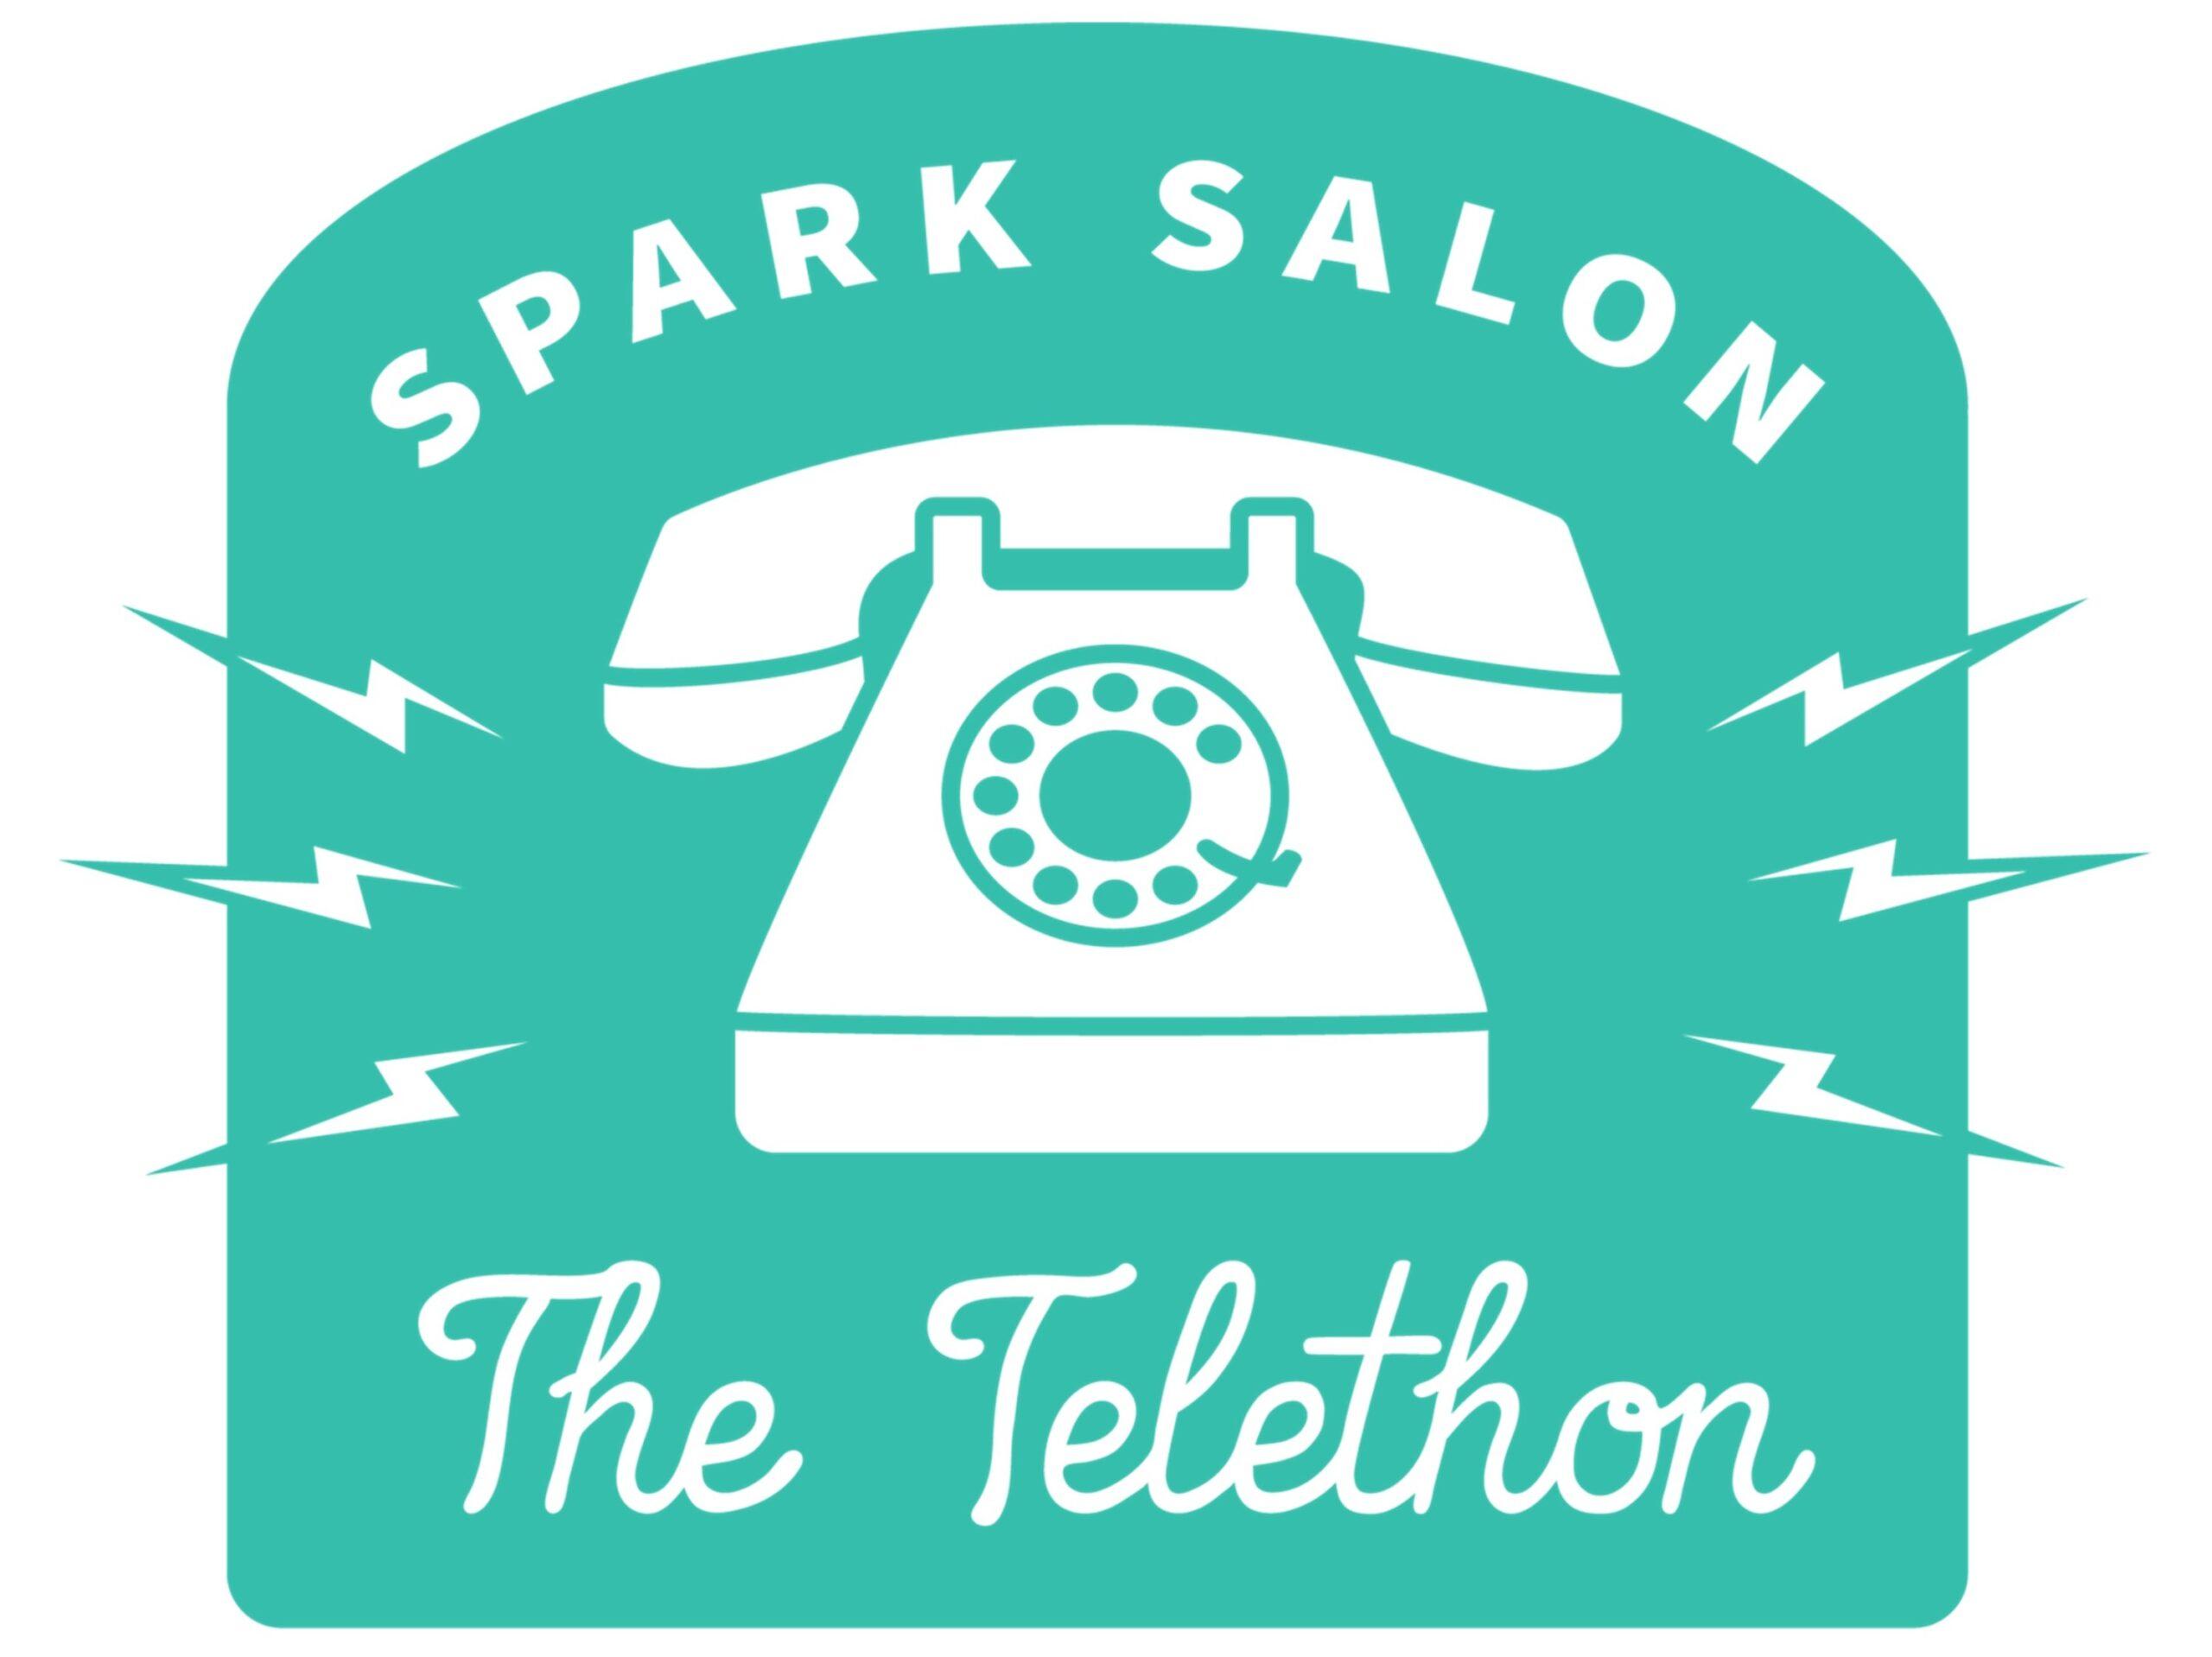 Spark-Telethon-Logo-1